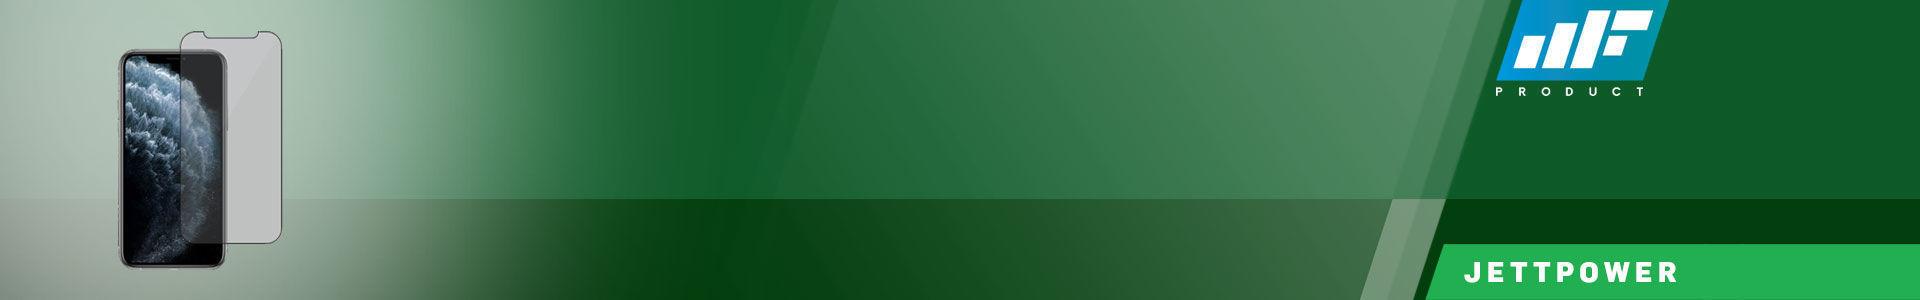 MF Product Jettpower 0385 Privacy Ekran Koruyucu Cam iPhone X/Xs/11 Pro hemen al, hemen gelsin!